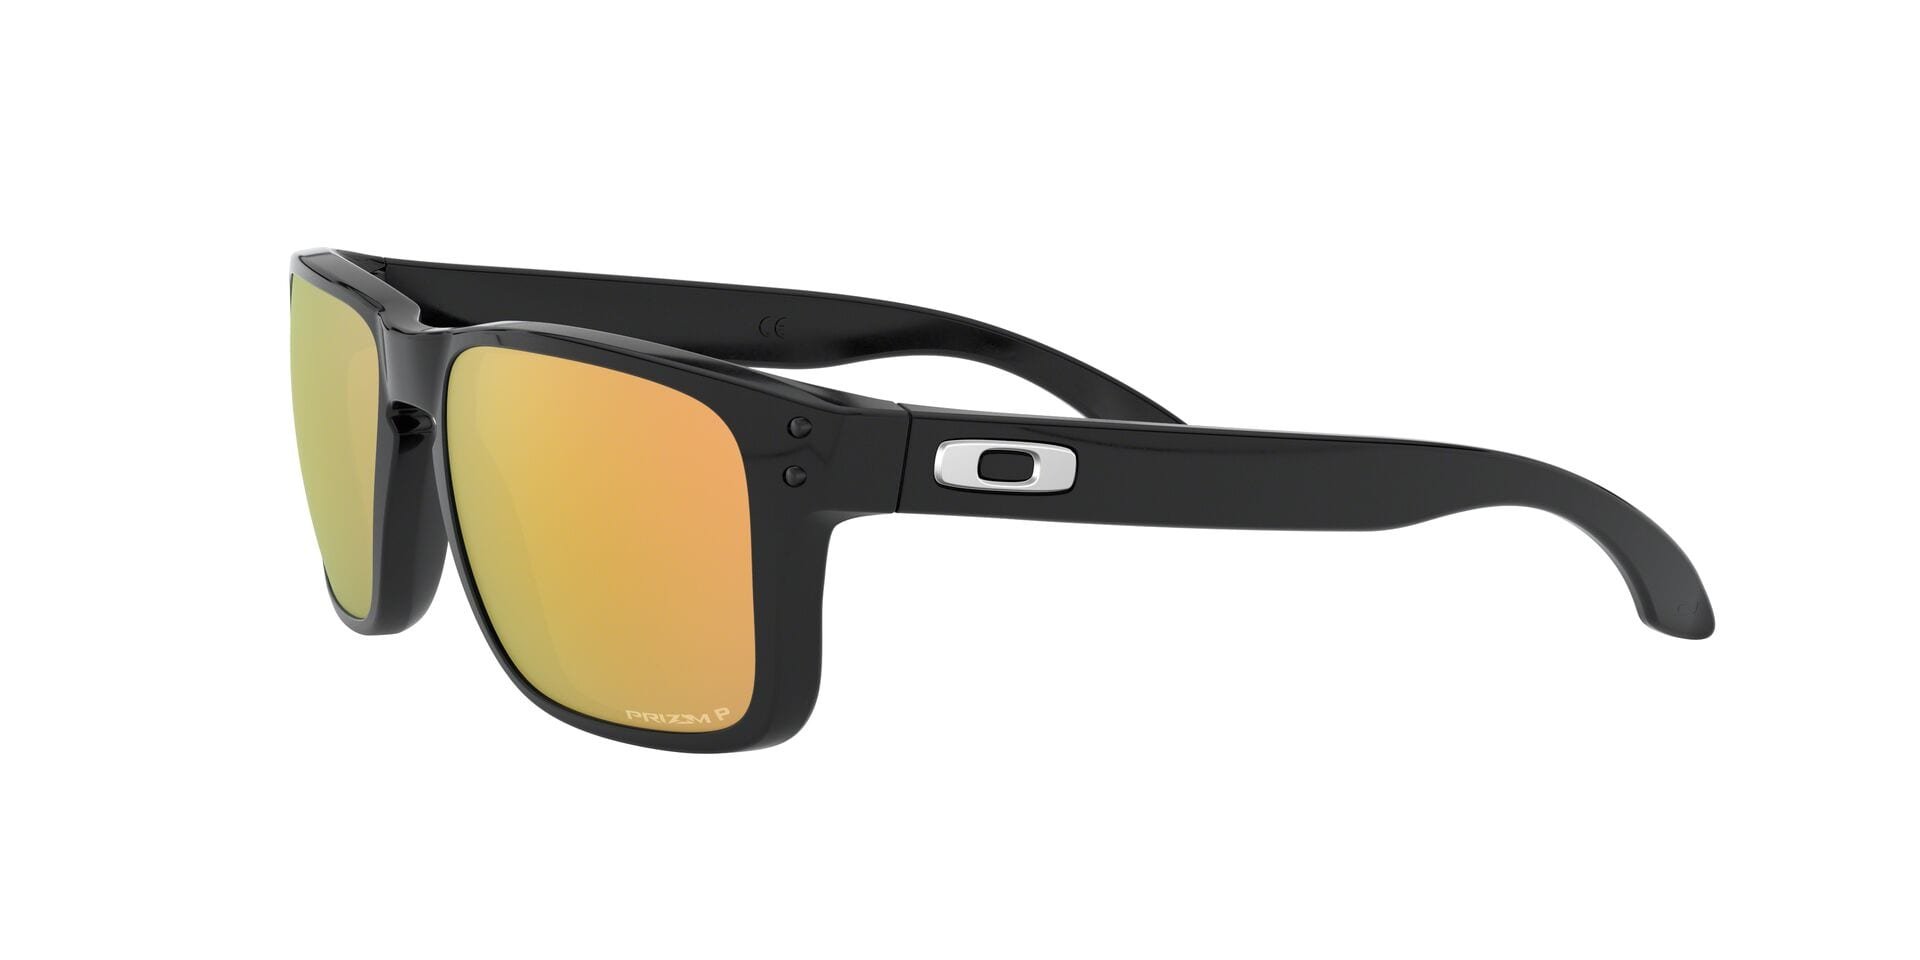 759f4b7231 Oakley Holbrook XS Sunglasses - ADS Lifestyle